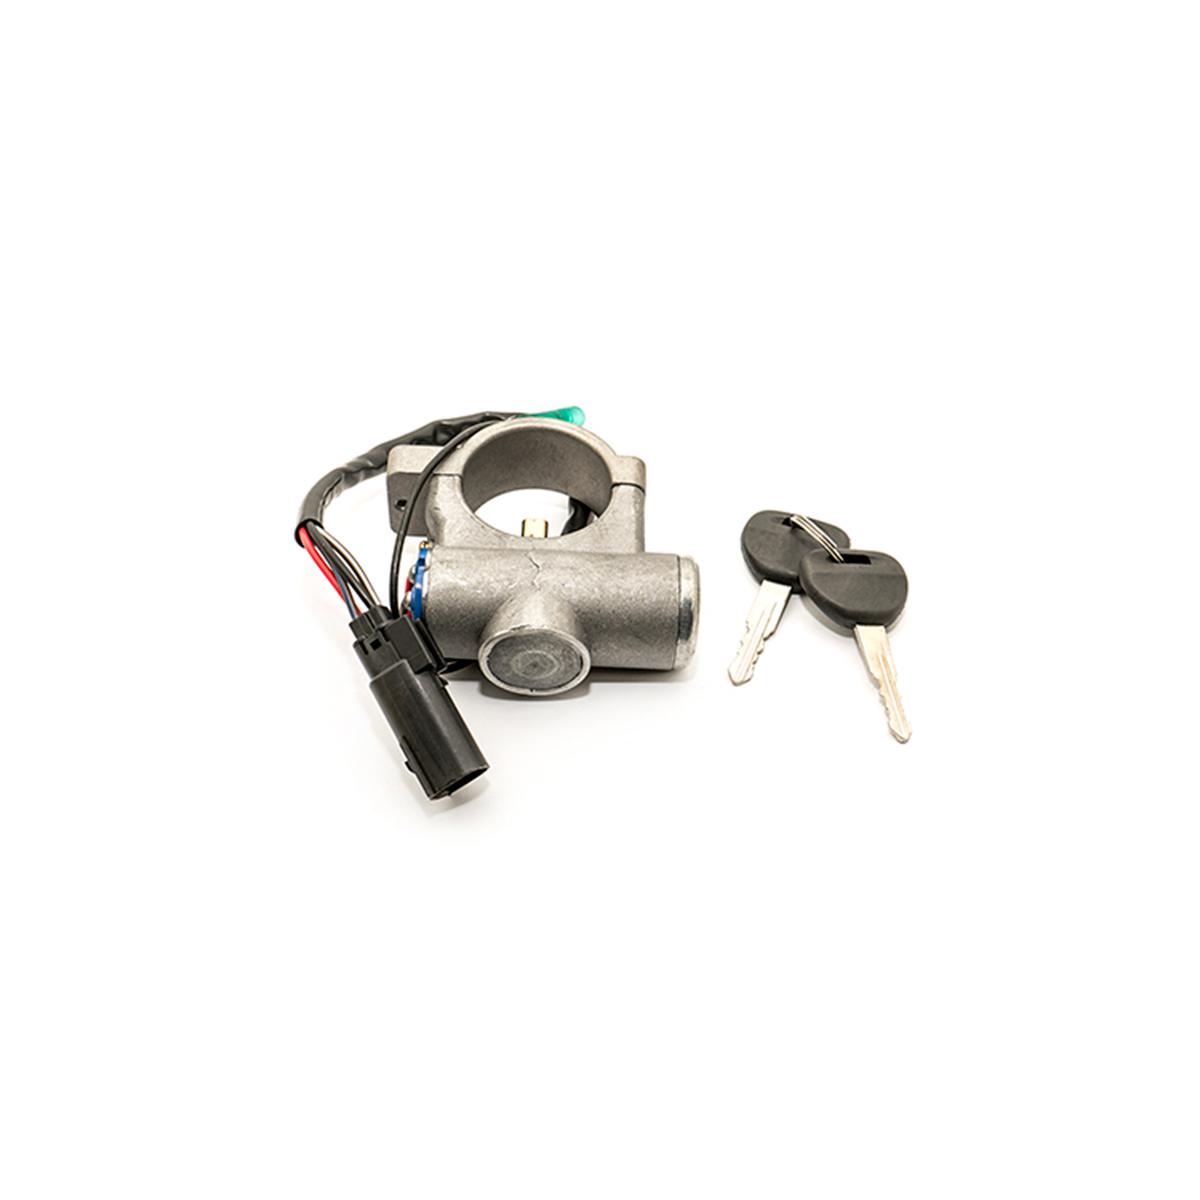 hight resolution of power mower sales